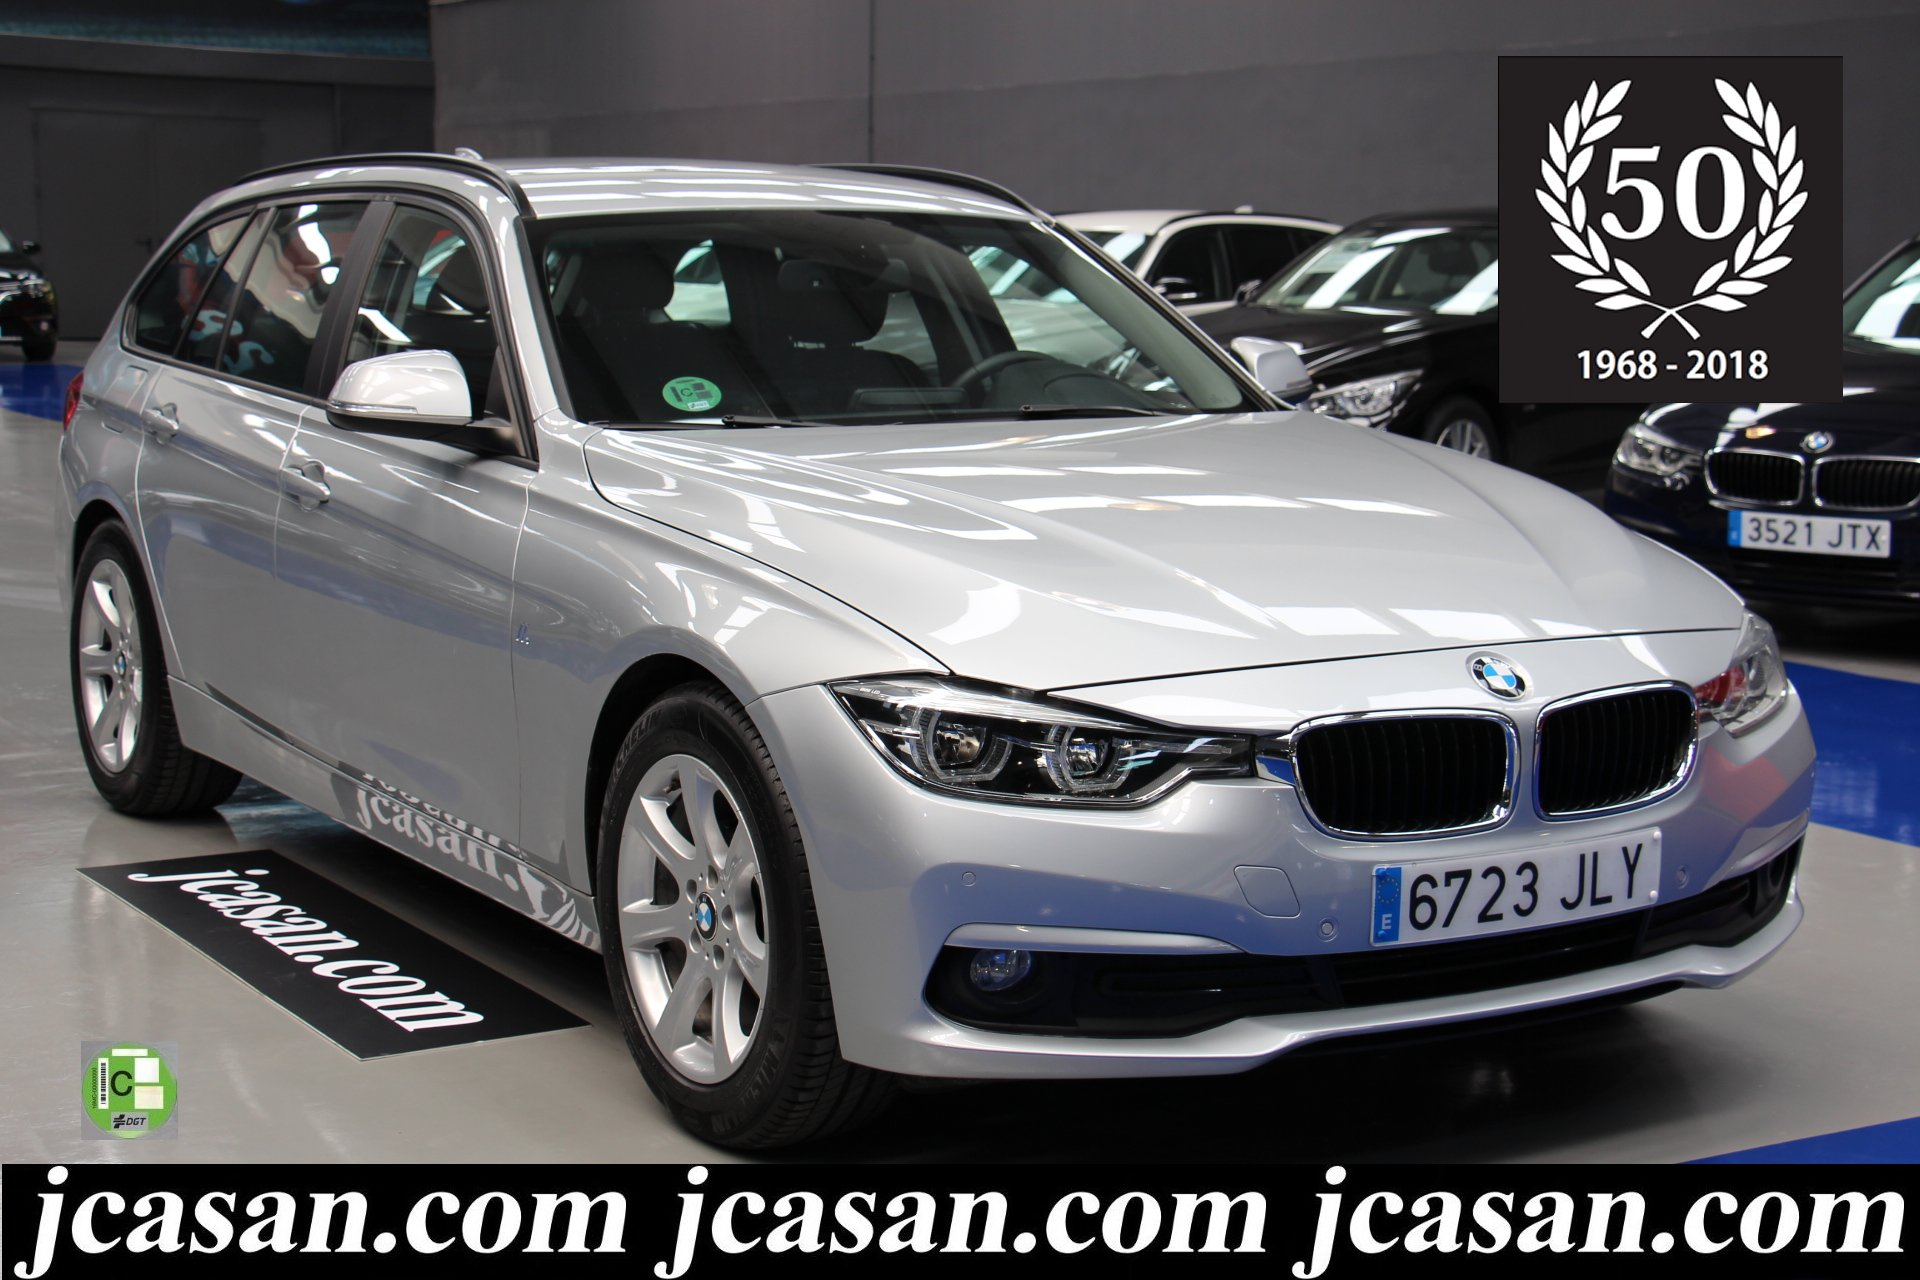 BMW 318d 2.0 150 CV TOURING 6 VEL E6